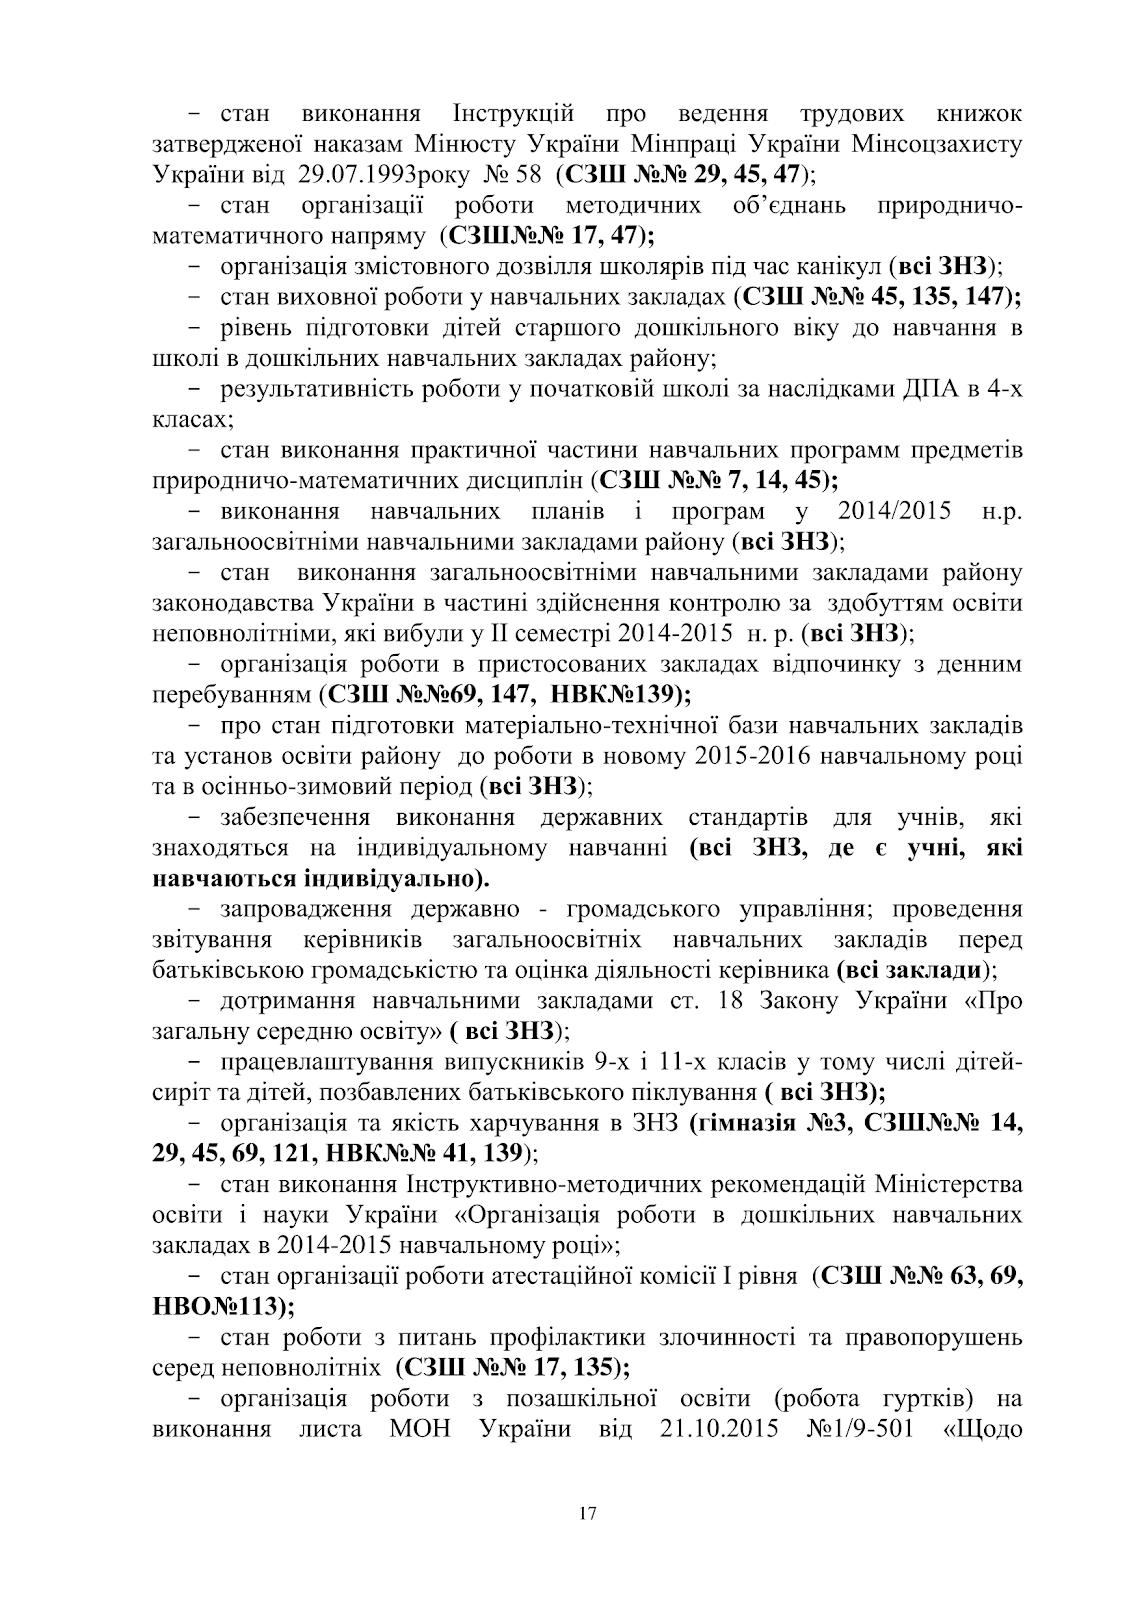 C:\Users\Валерия\Desktop\план 2016 рік\план 2016 рік-017.png